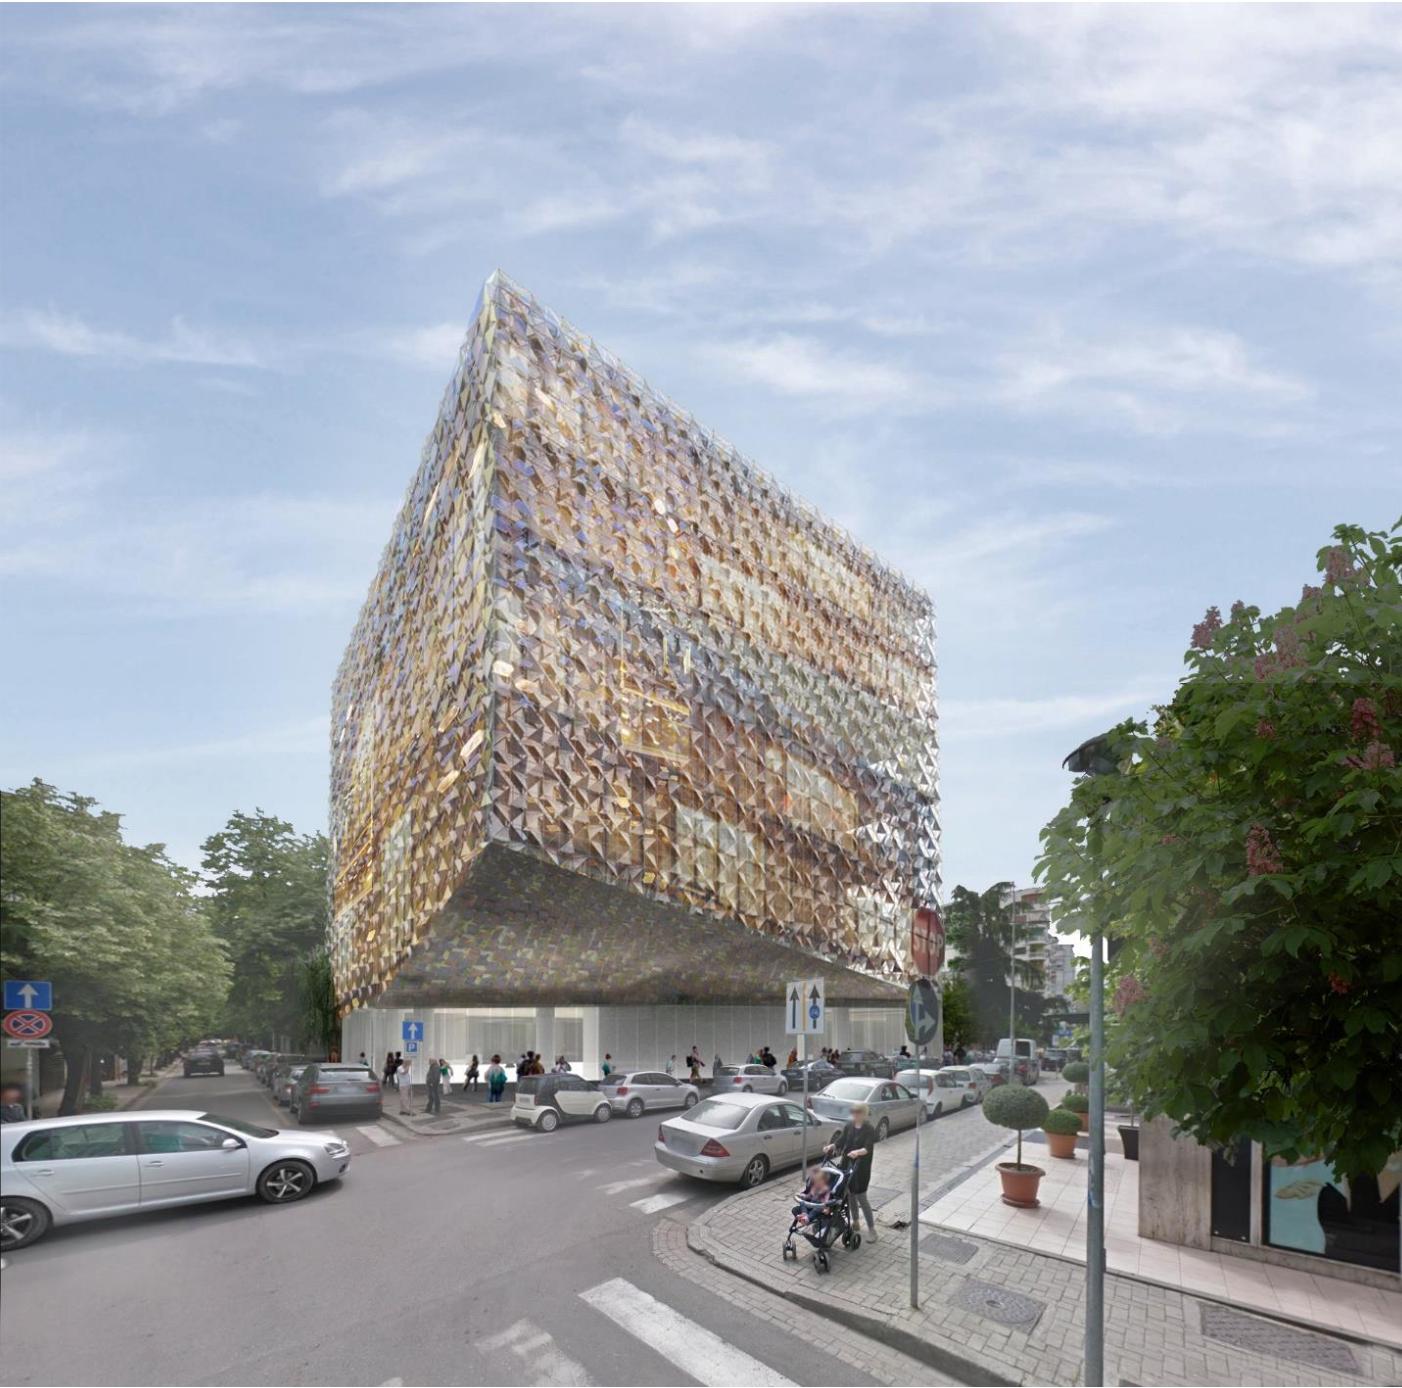 Architectural render of Stefano Boeri's Bllok.